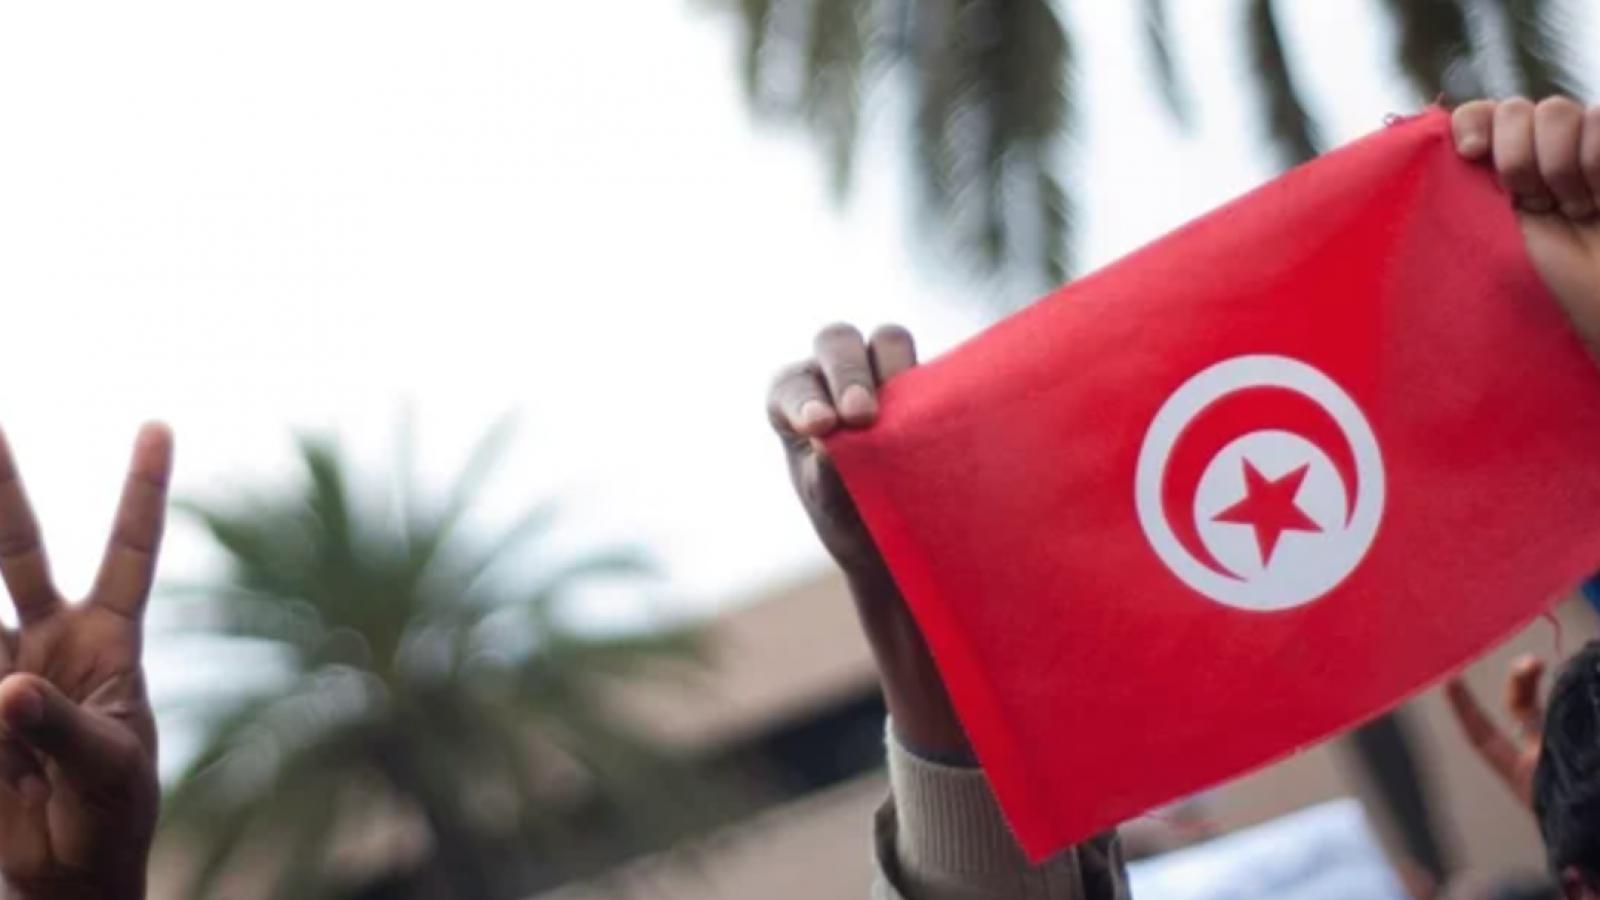 Citizens raise the peace sign and the Tunisian flag